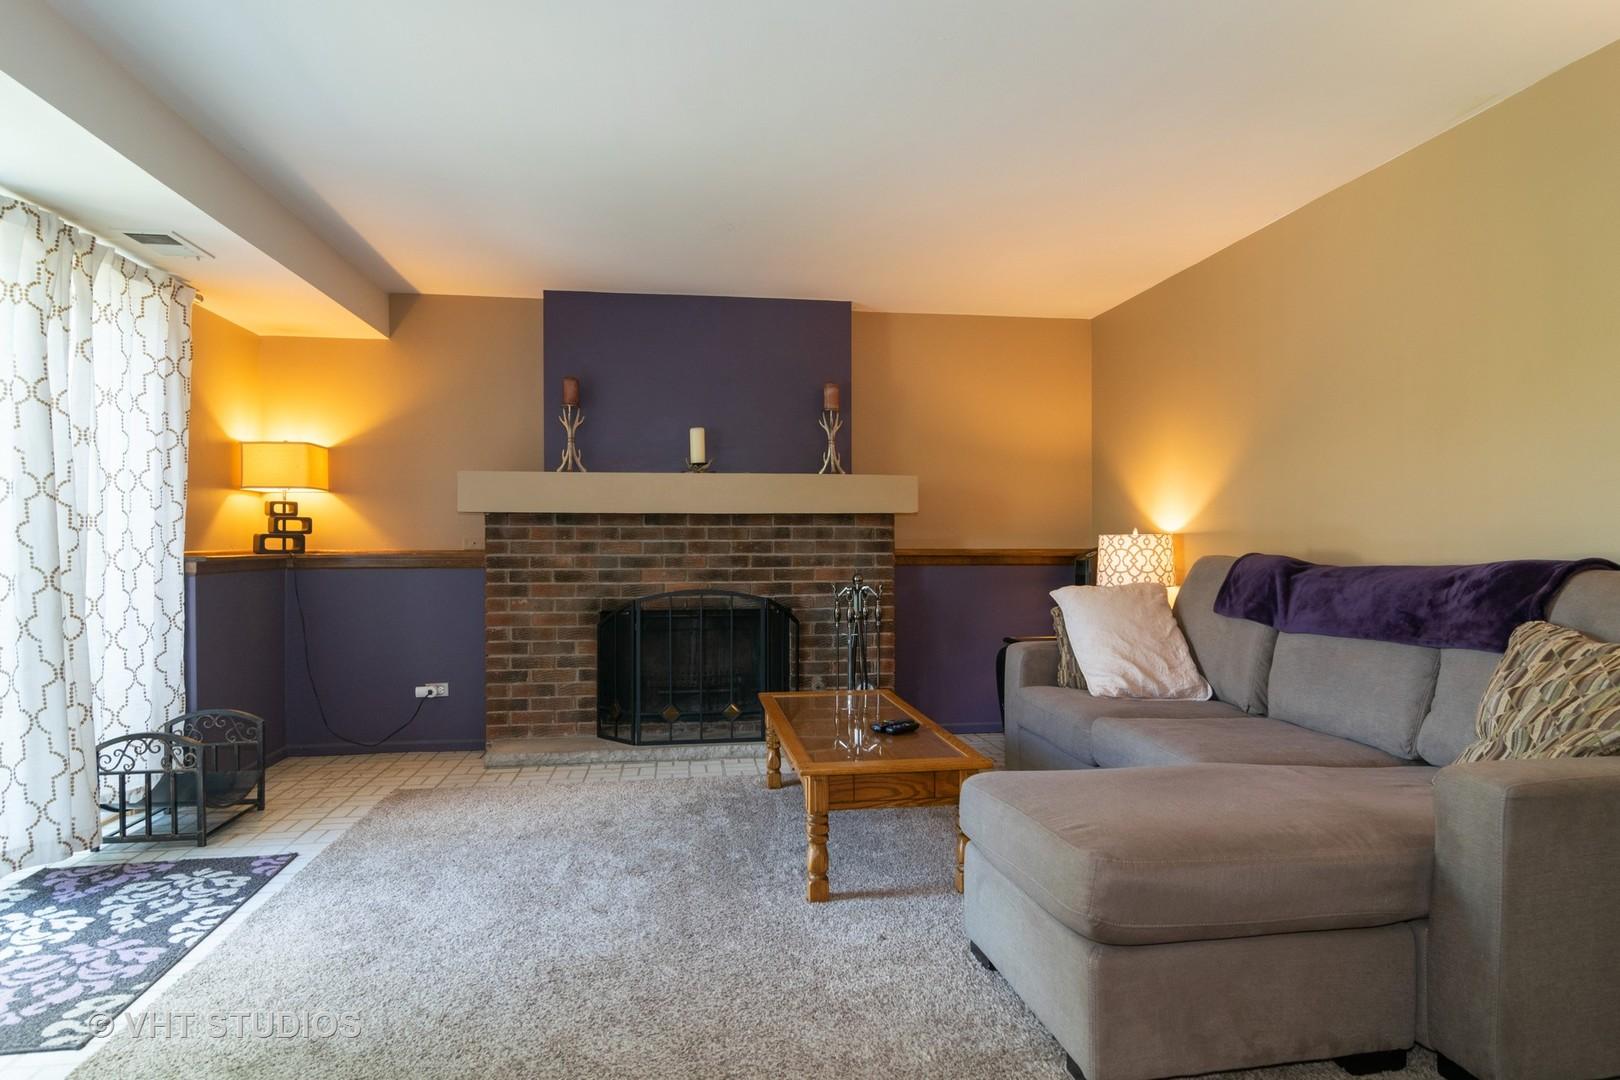 1180 Hygate, Roselle, Illinois, 60172